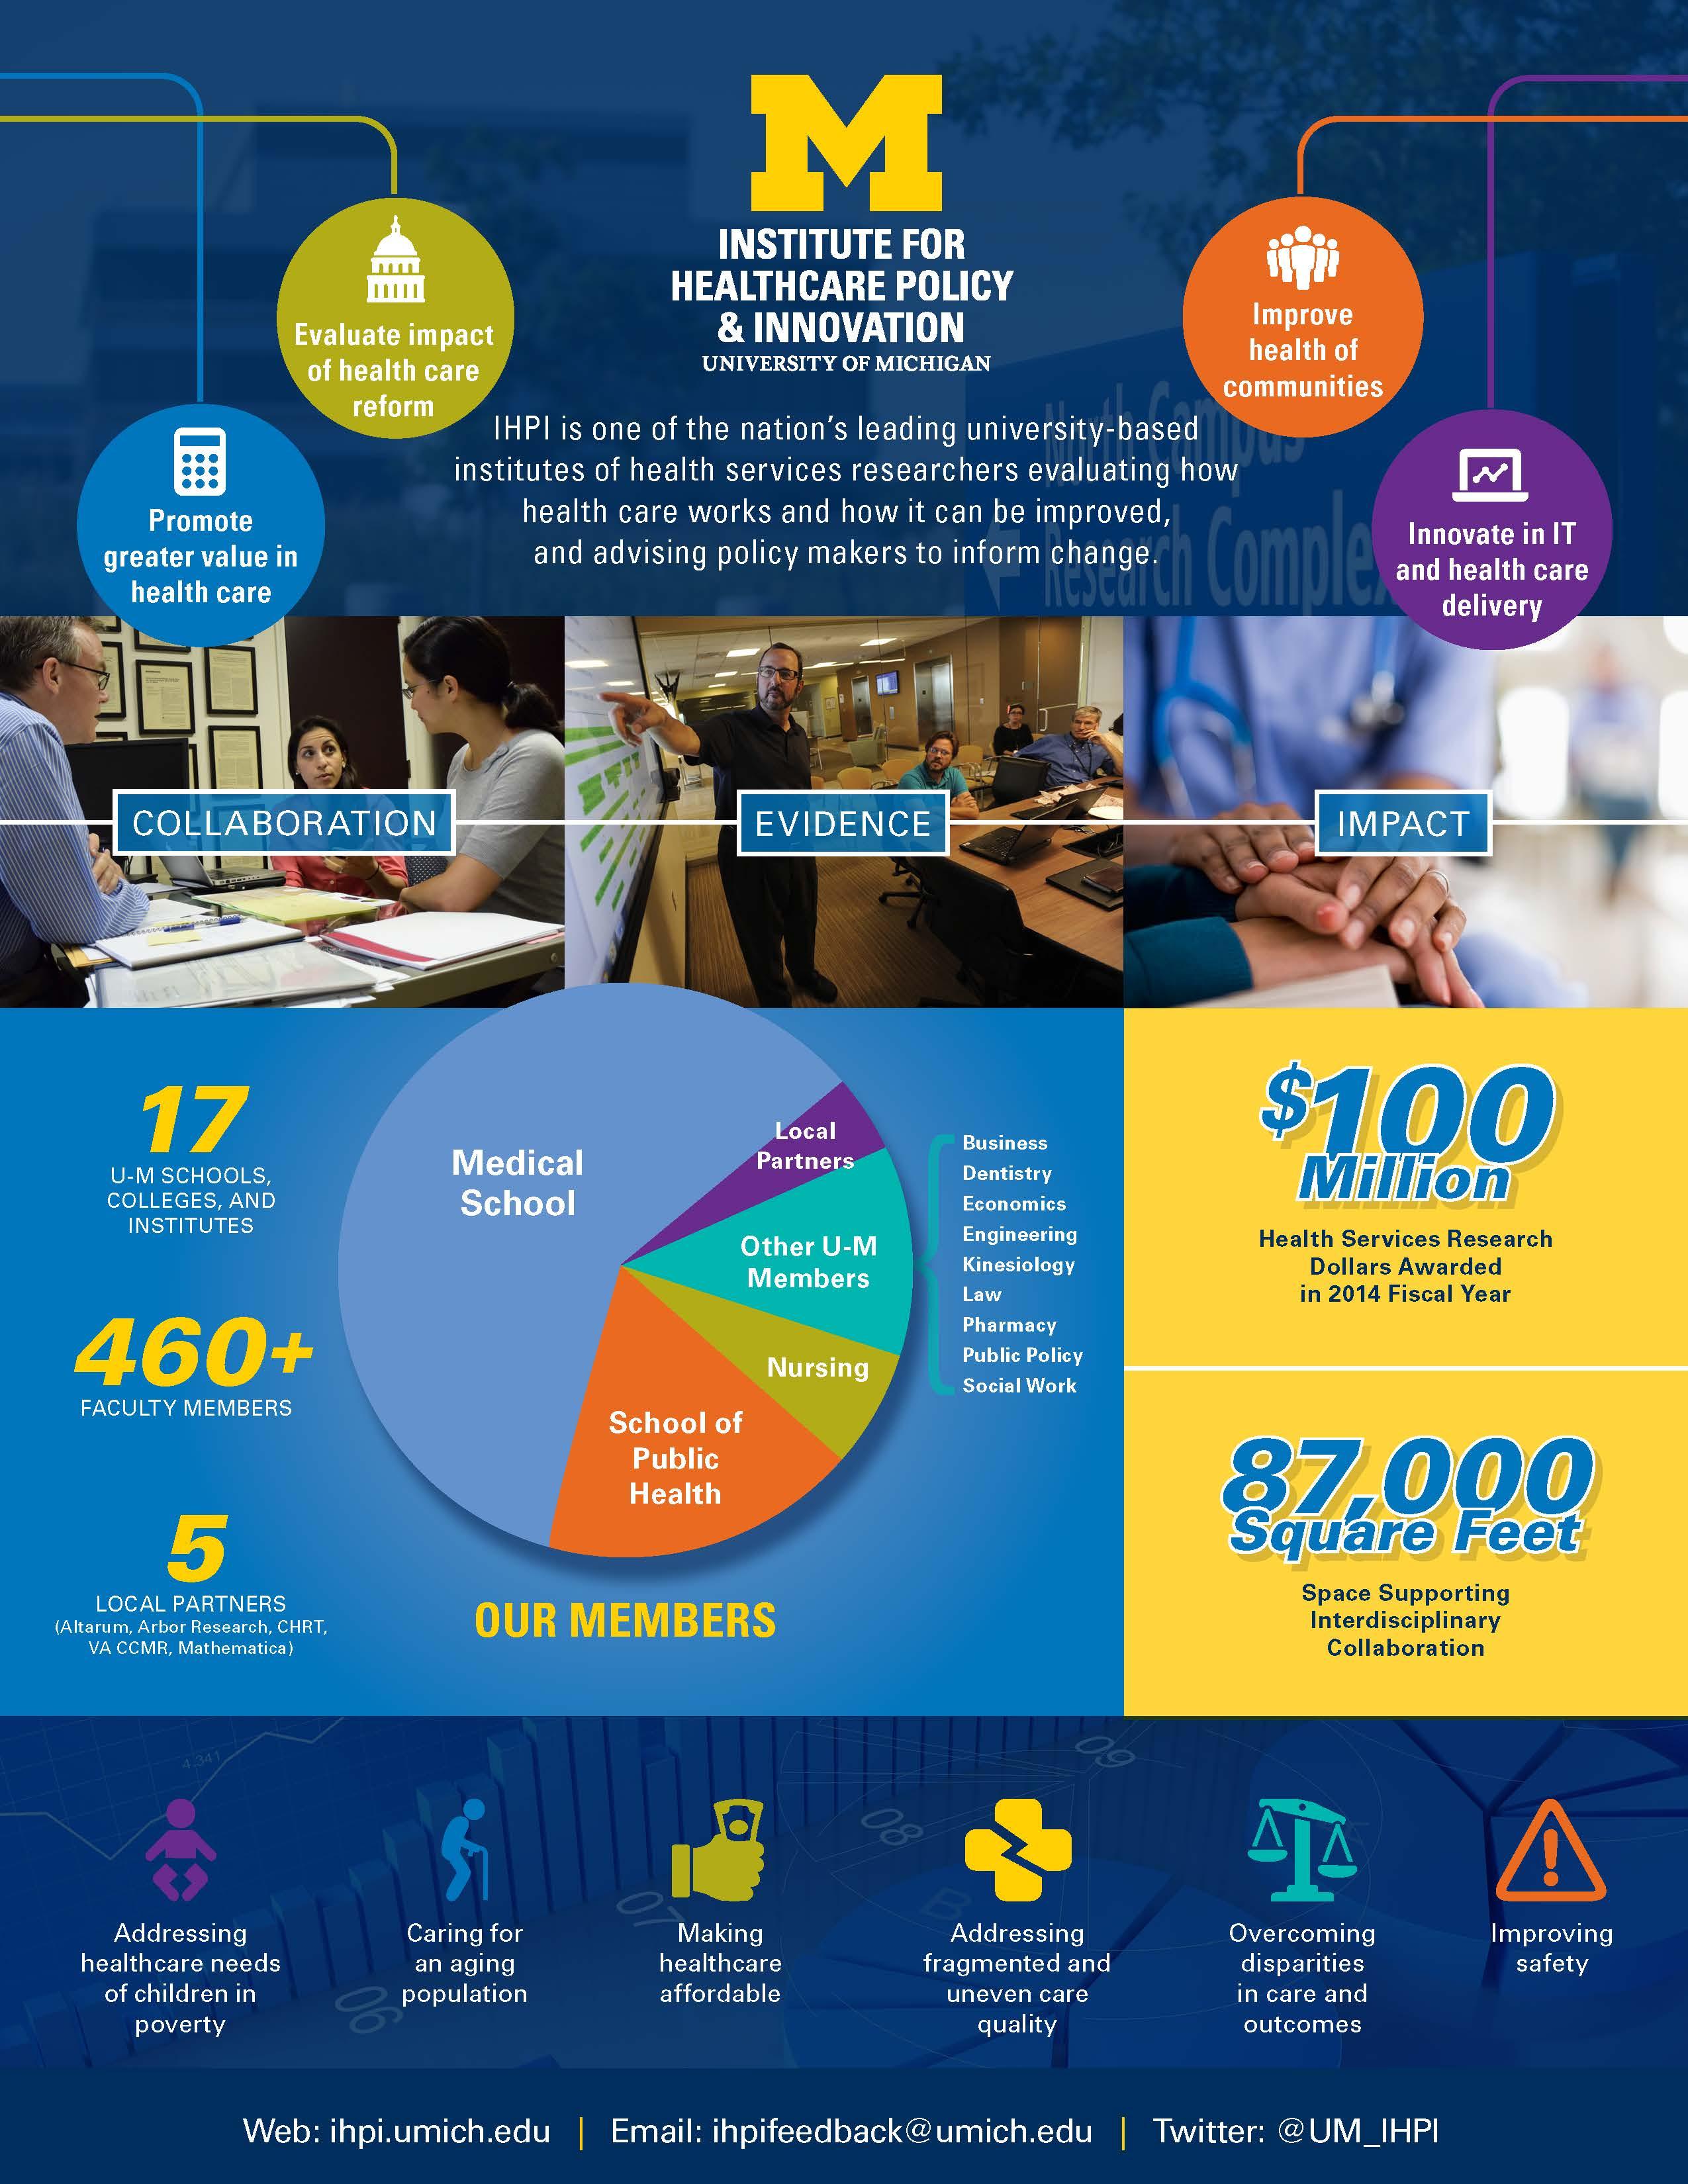 June 2015 Infographic